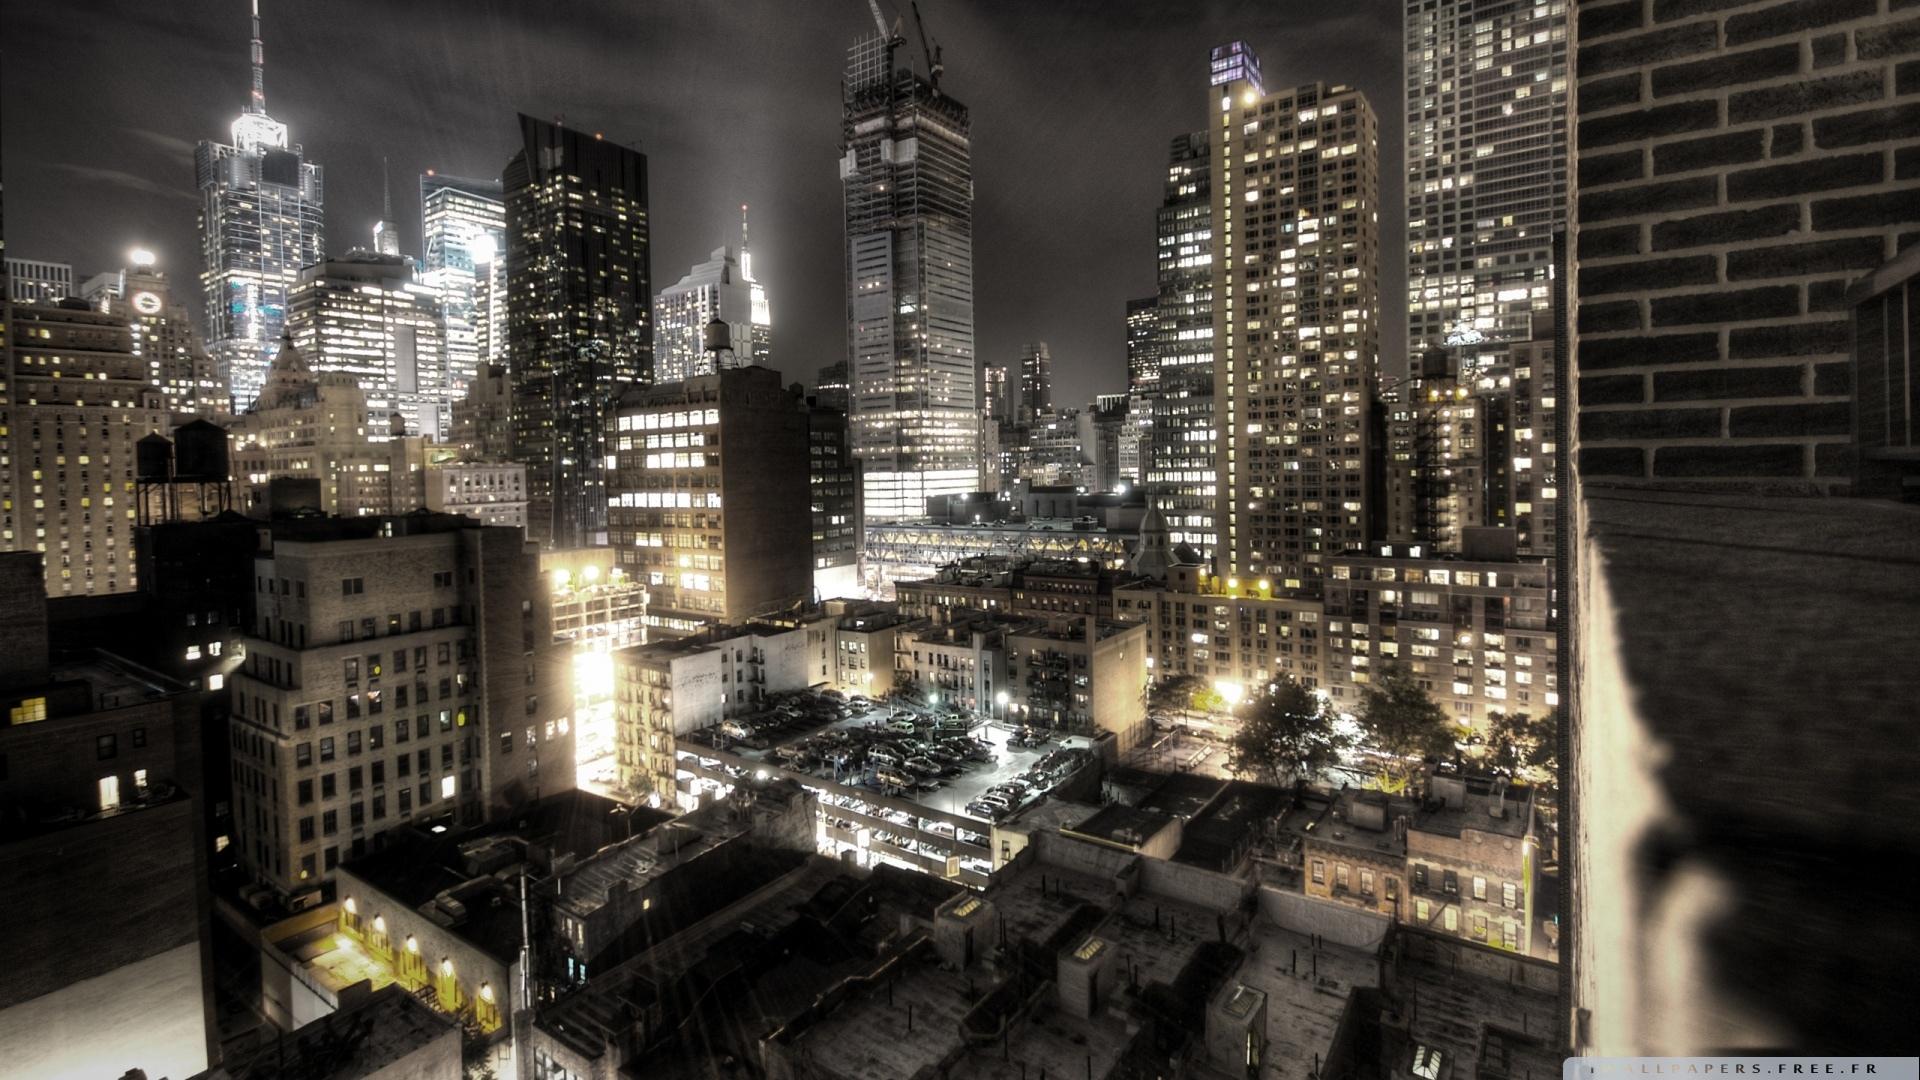 new york city at night lights wallpaper 1920x1080   new york city at 1920x1080